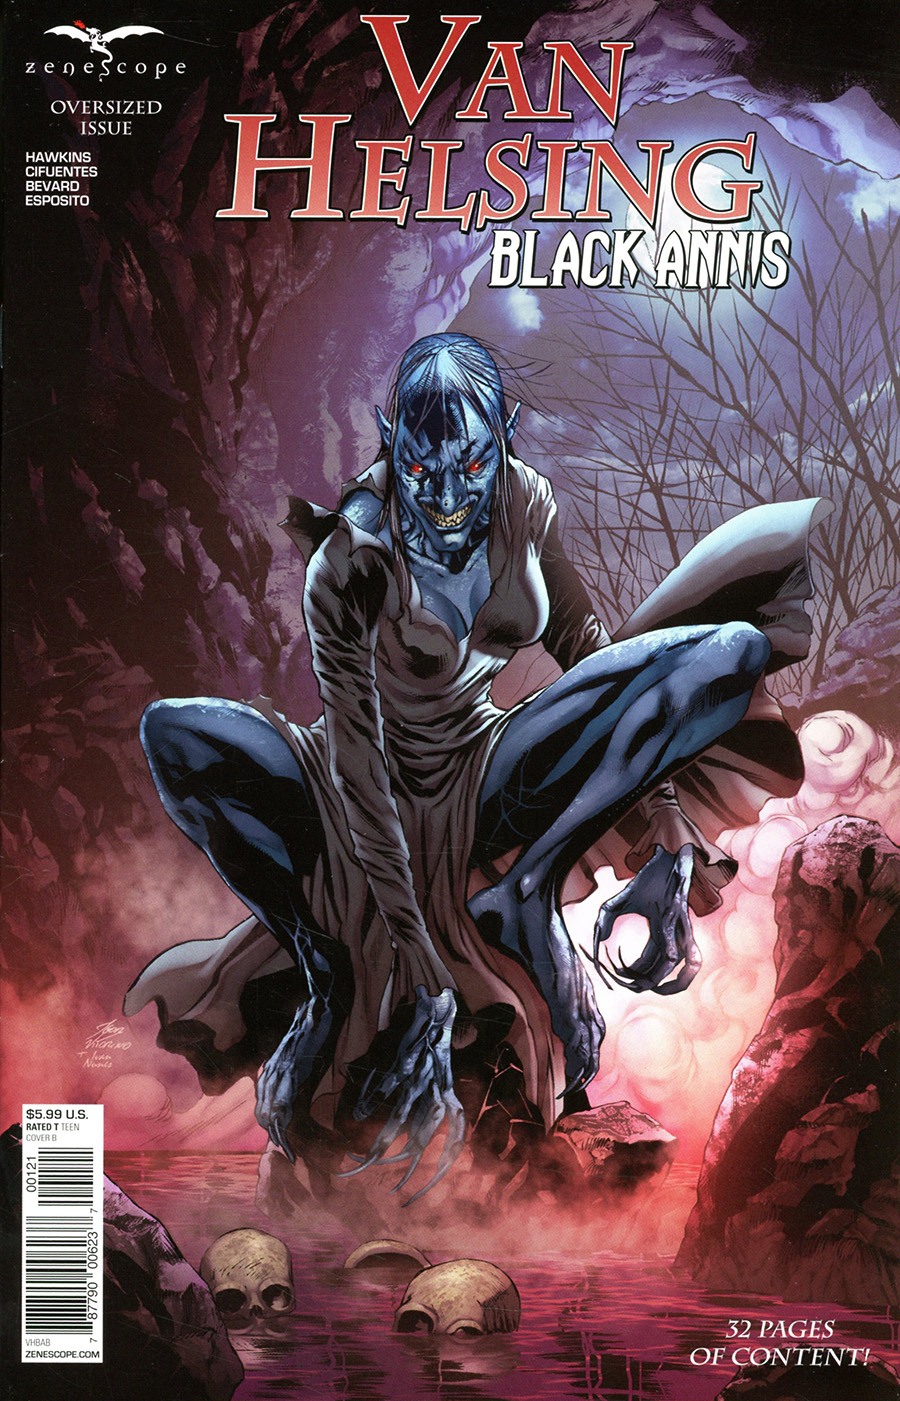 Grimm Fairy Tales Presents Van Helsing Black Annis #1 (One Shot) Cover B Igor Vitorino